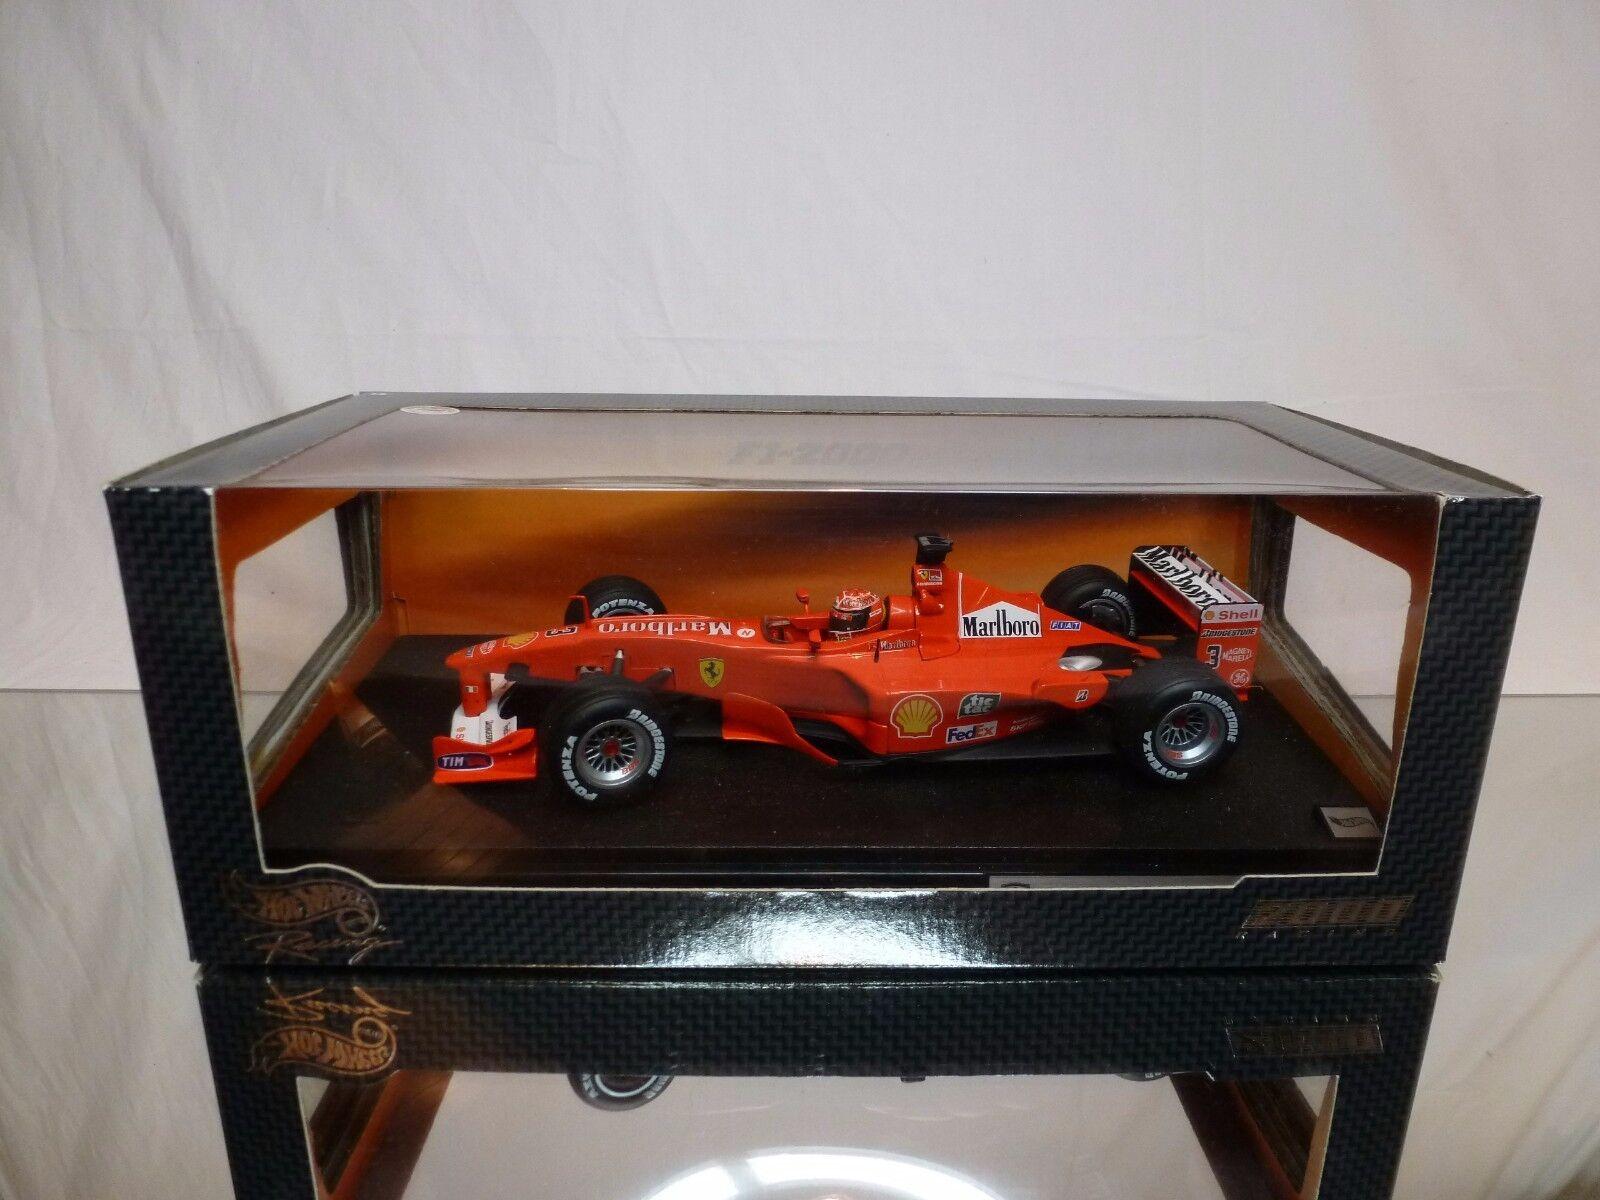 HOT WHEELS 26737 FERRARI F1-2000 - SCHUMACHER F1 1 18 RARE - EXCELLENT IN BOX